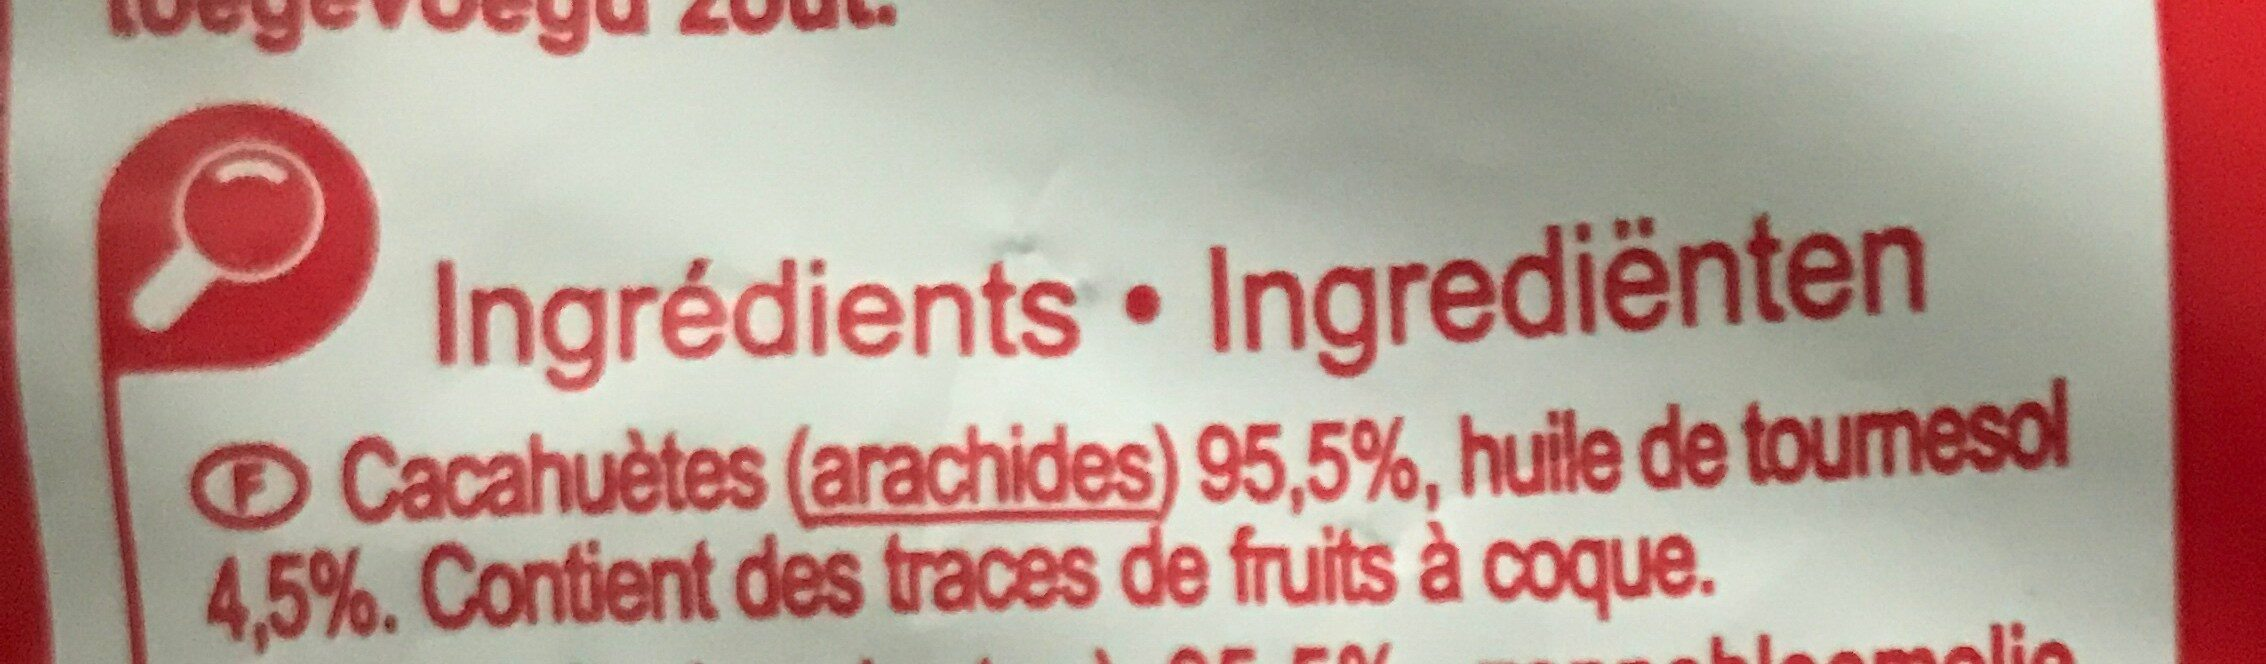 Cacahuètes grillées - Ingrediënten - fr